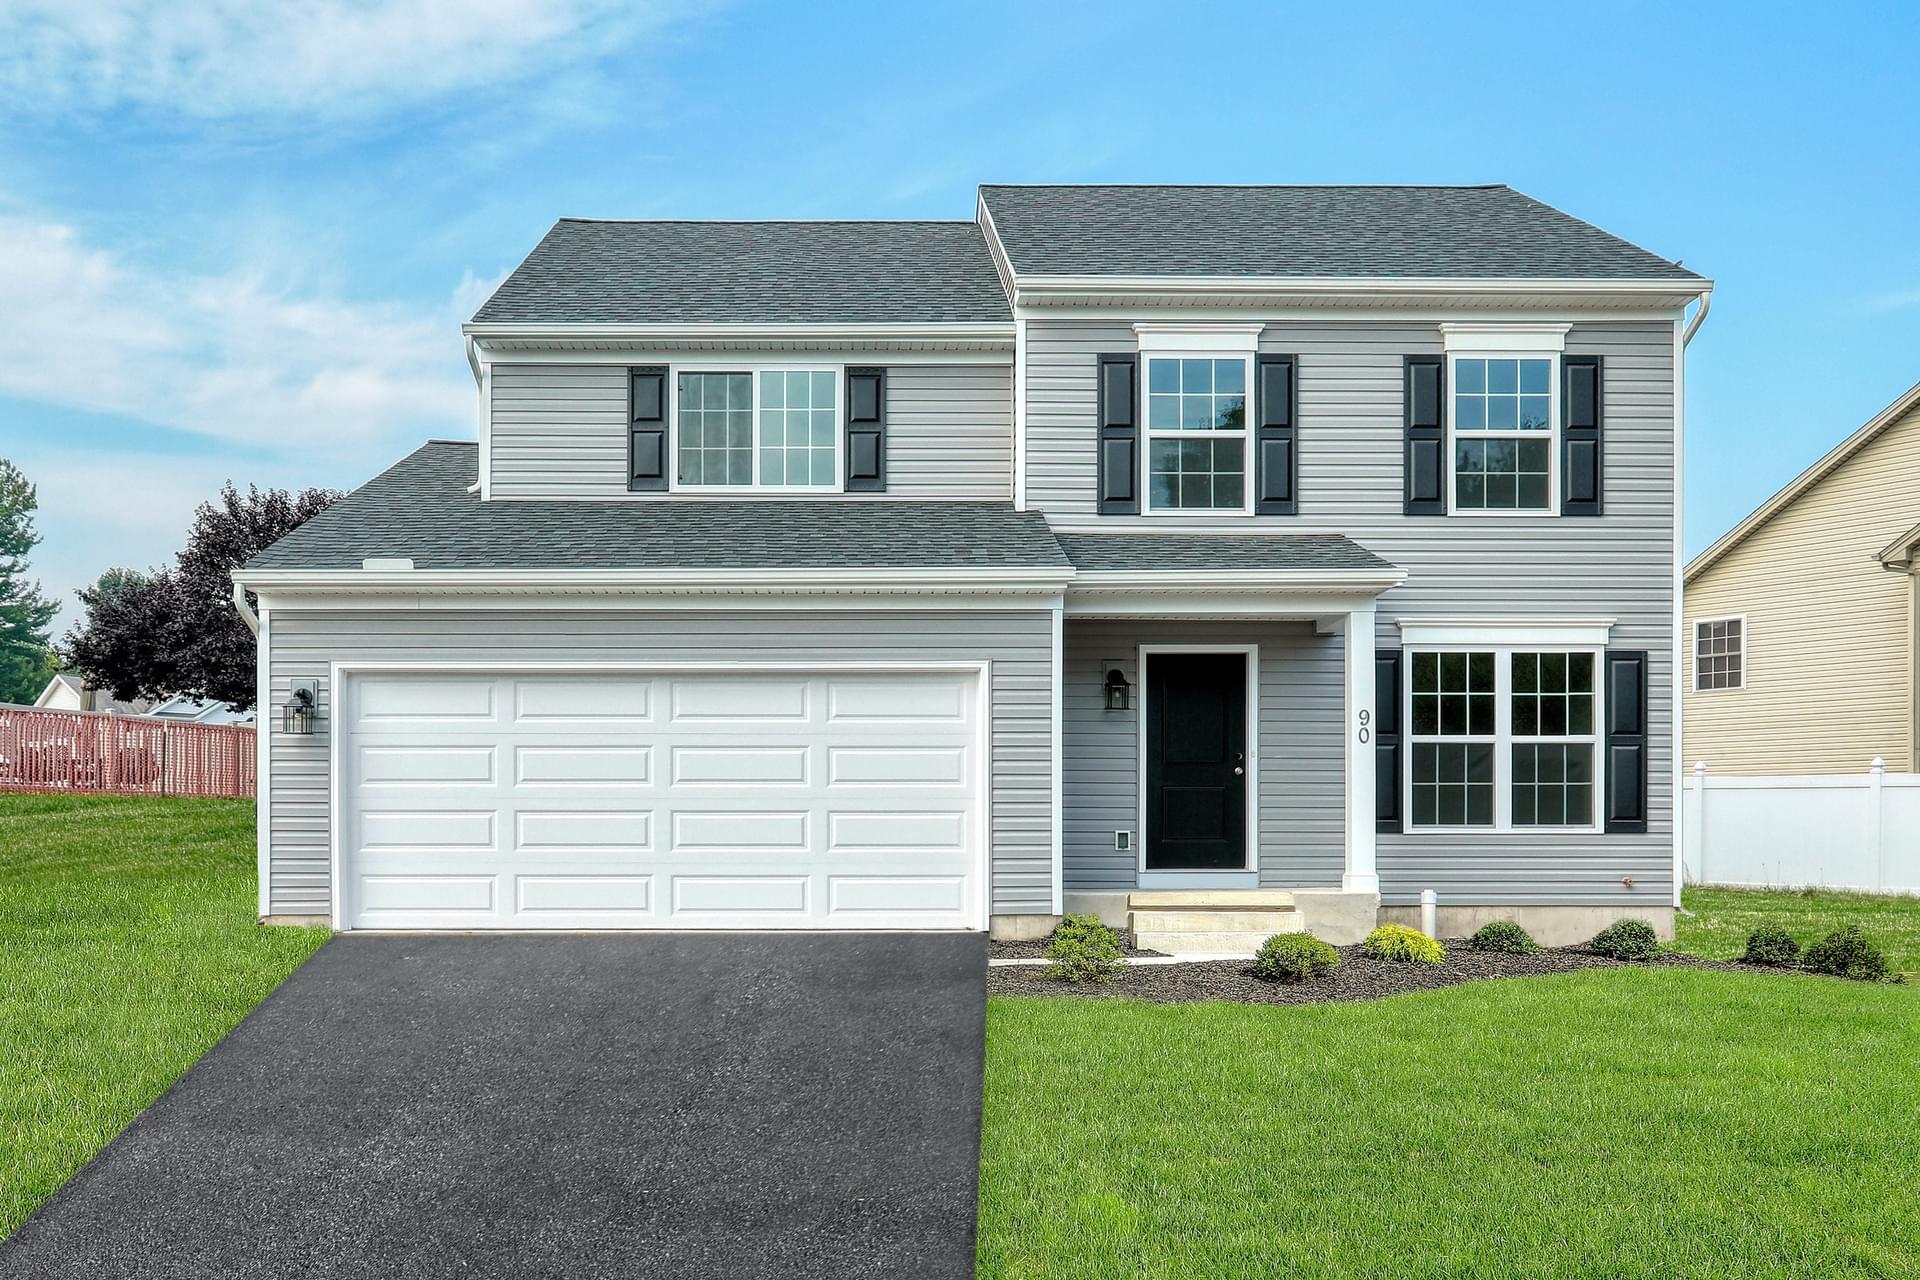 Bellwoode New Home in Mechanicsburg, PA